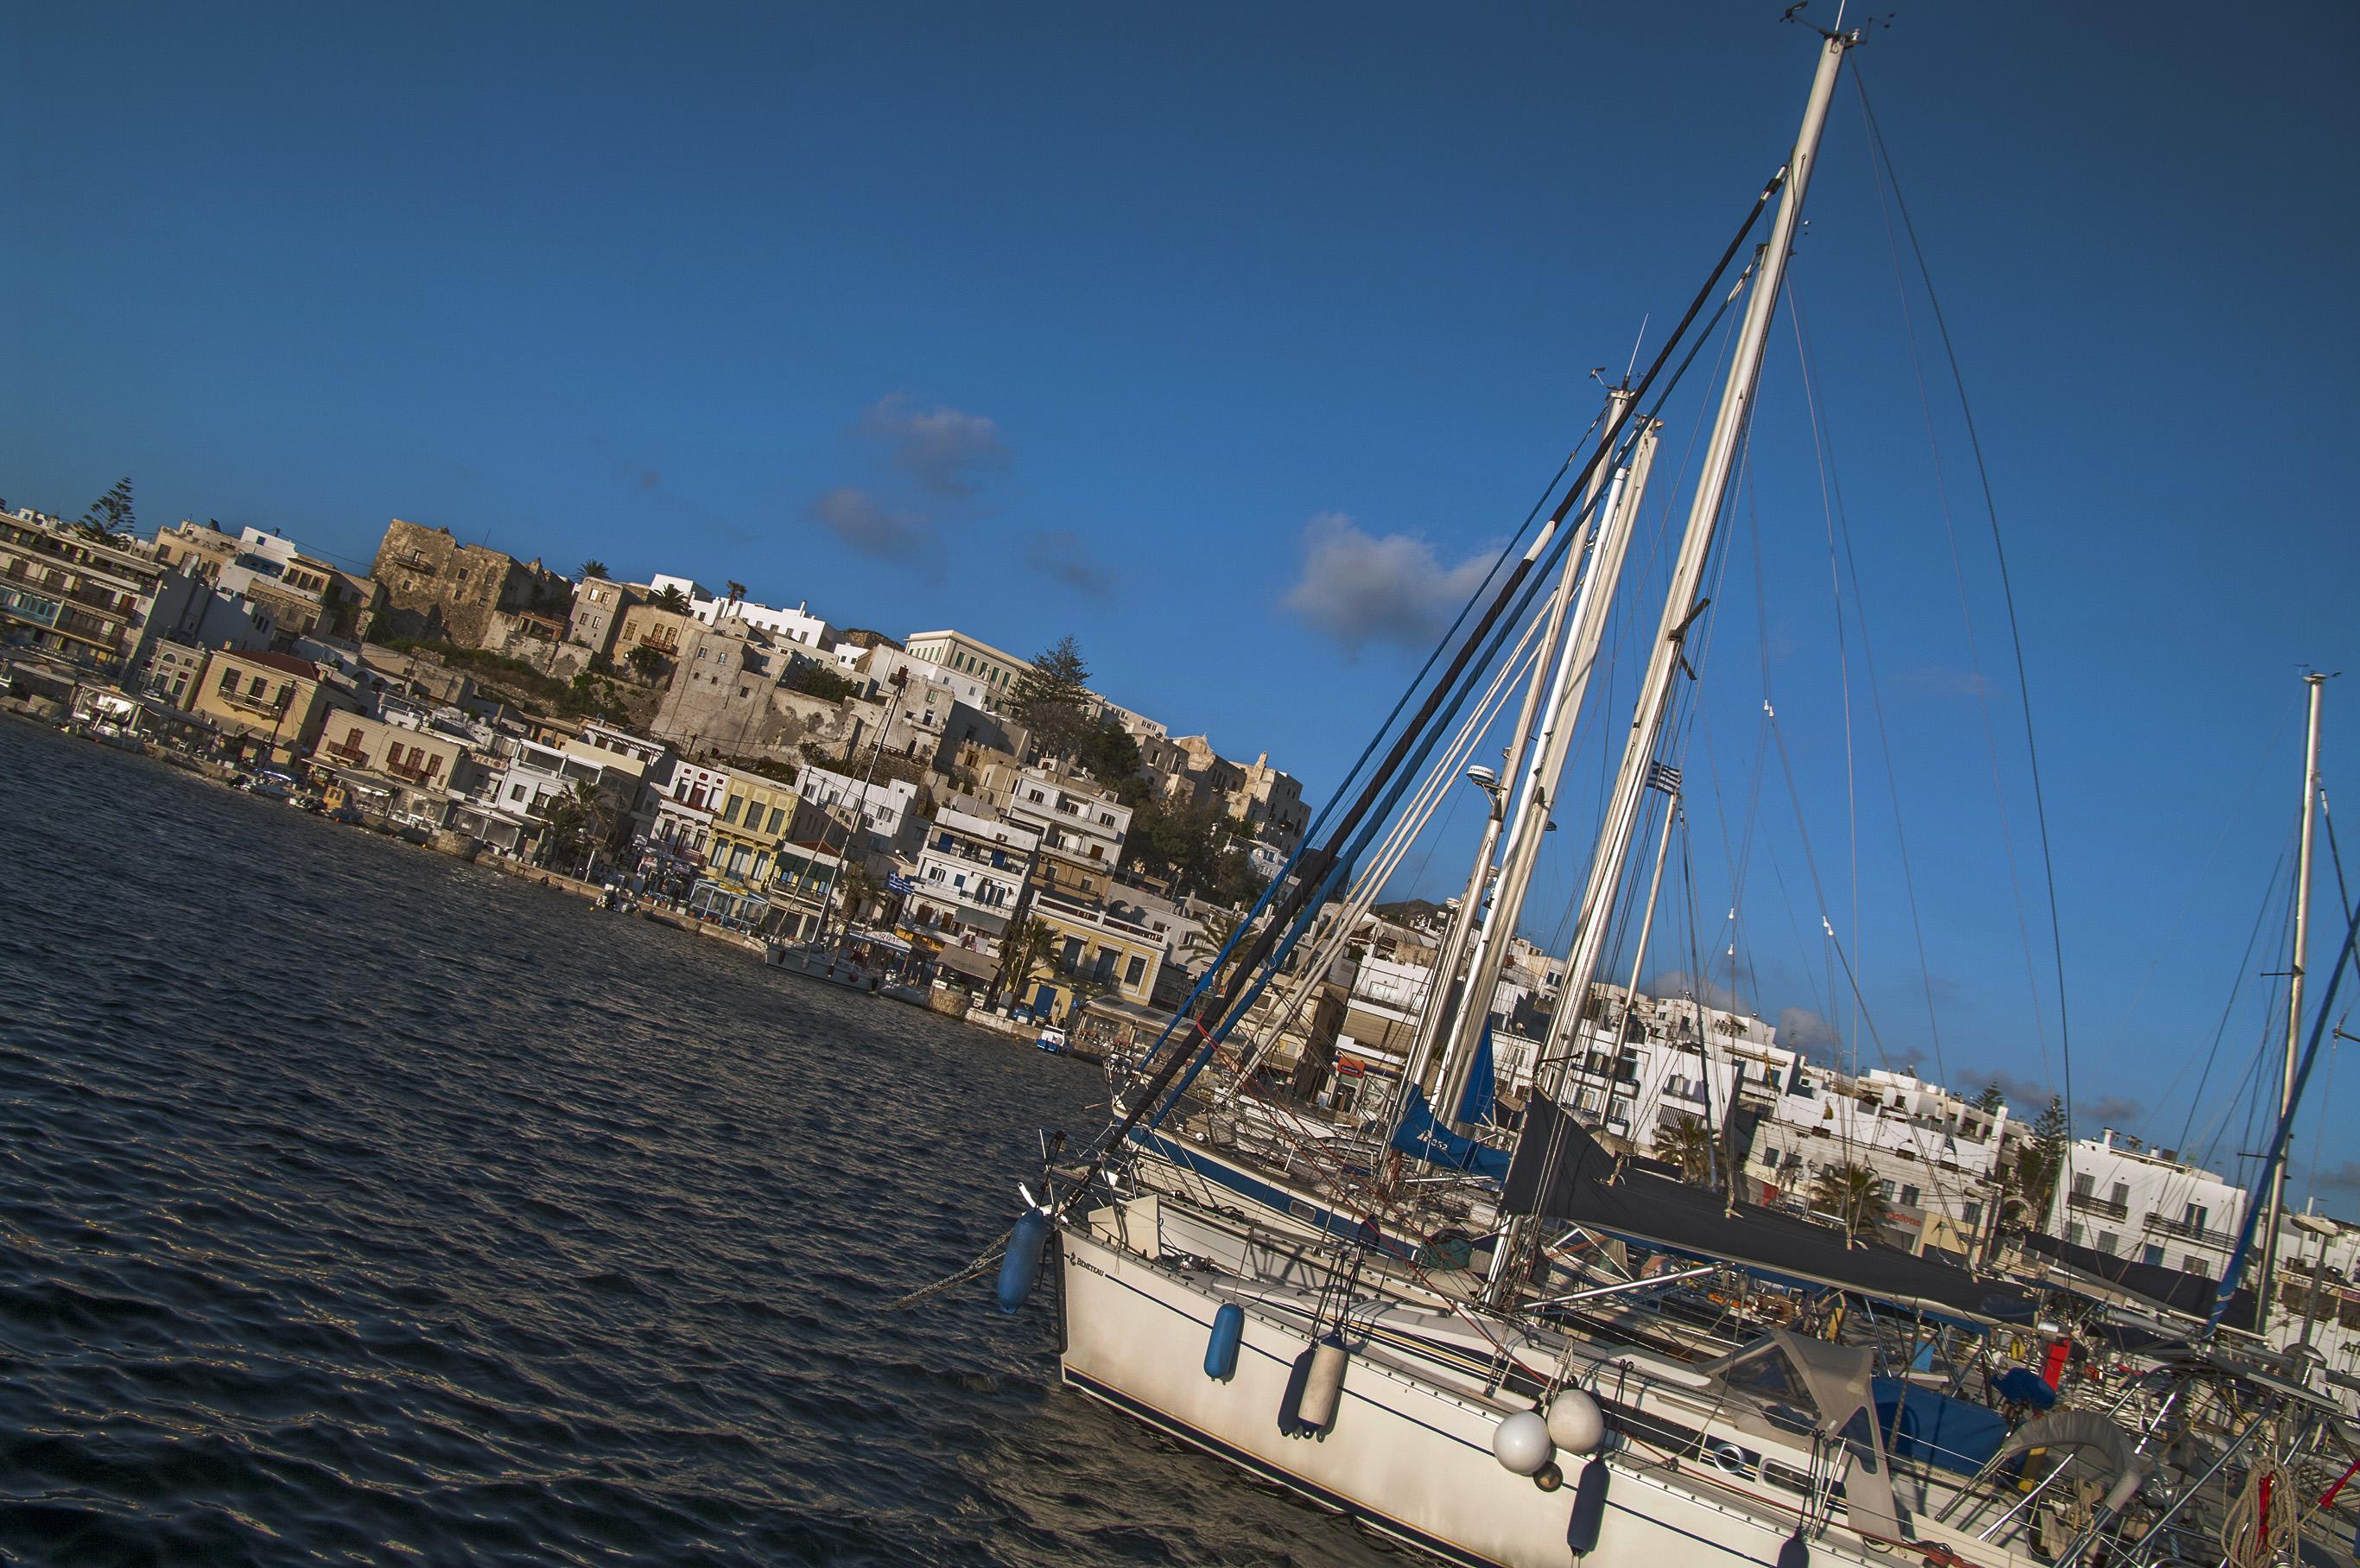 Art hopping on the Greek Islands